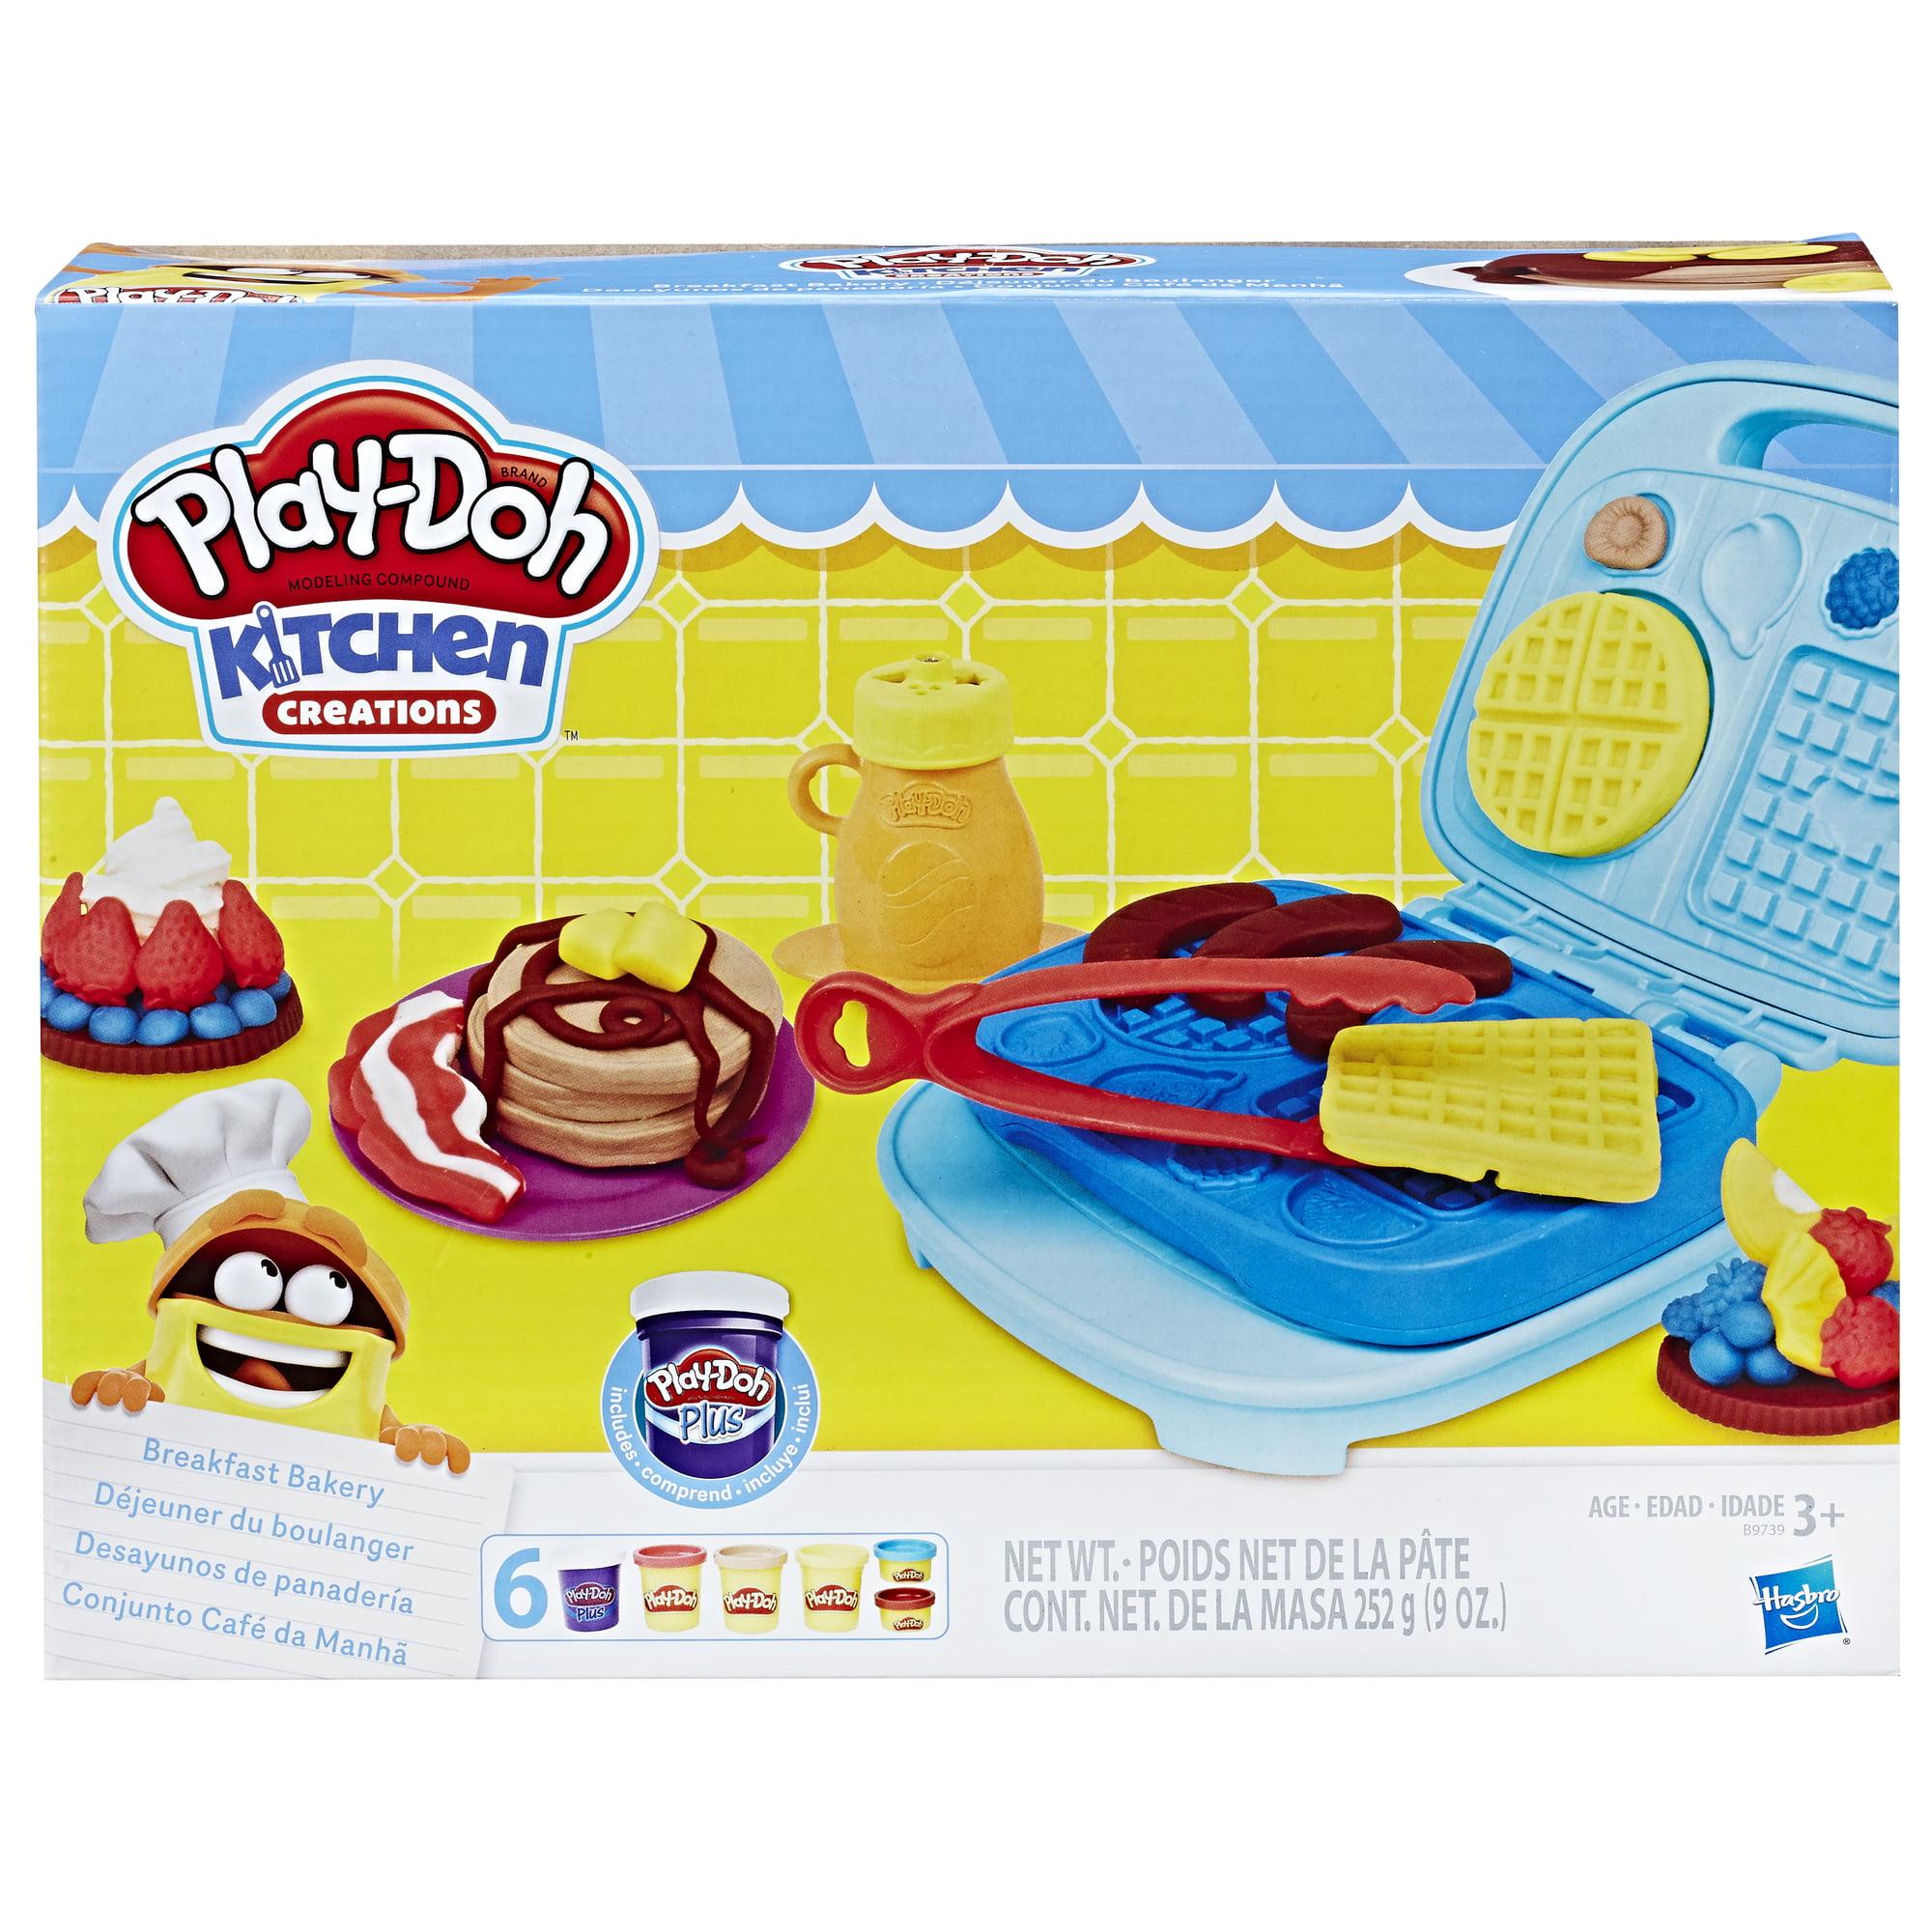 Play-Doh Kitchen Creations Breakfast Bakery Food Set